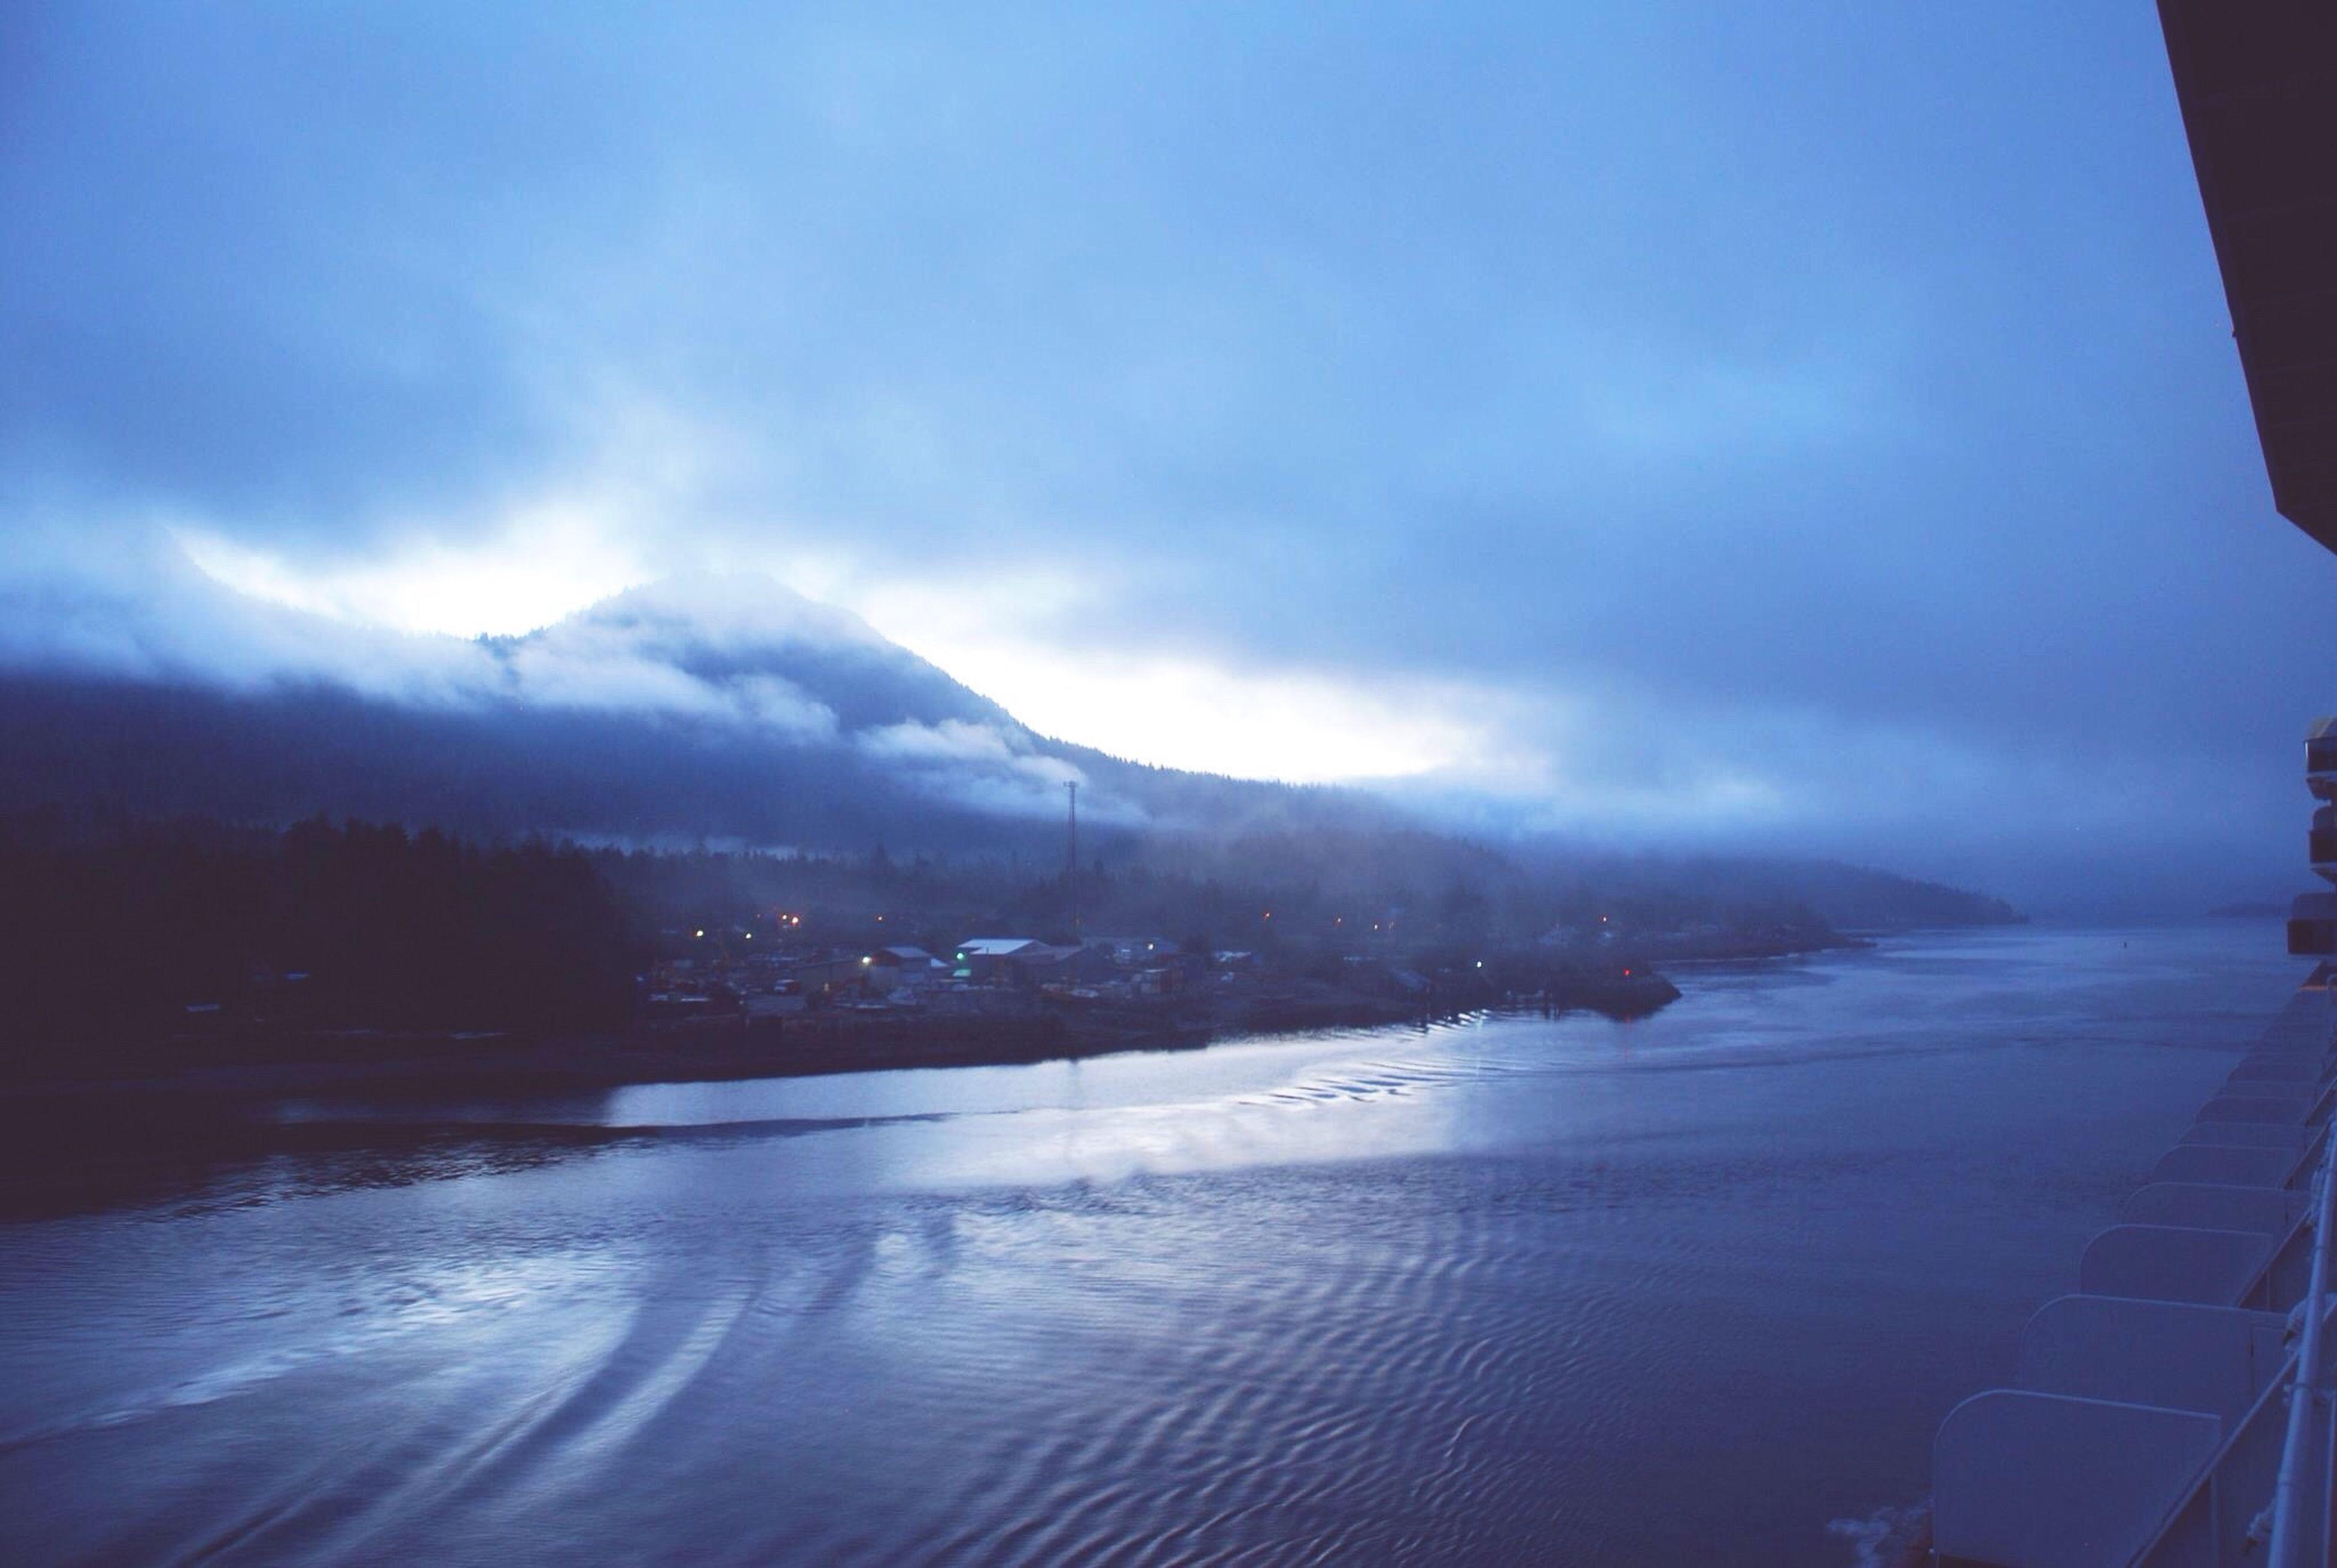 sky, water, scenics, cloud - sky, beauty in nature, tranquil scene, tranquility, nature, blue, cloud, cloudy, mountain, weather, idyllic, outdoors, no people, landscape, day, non-urban scene, remote, calm, coastline, travel destinations, majestic, overcast